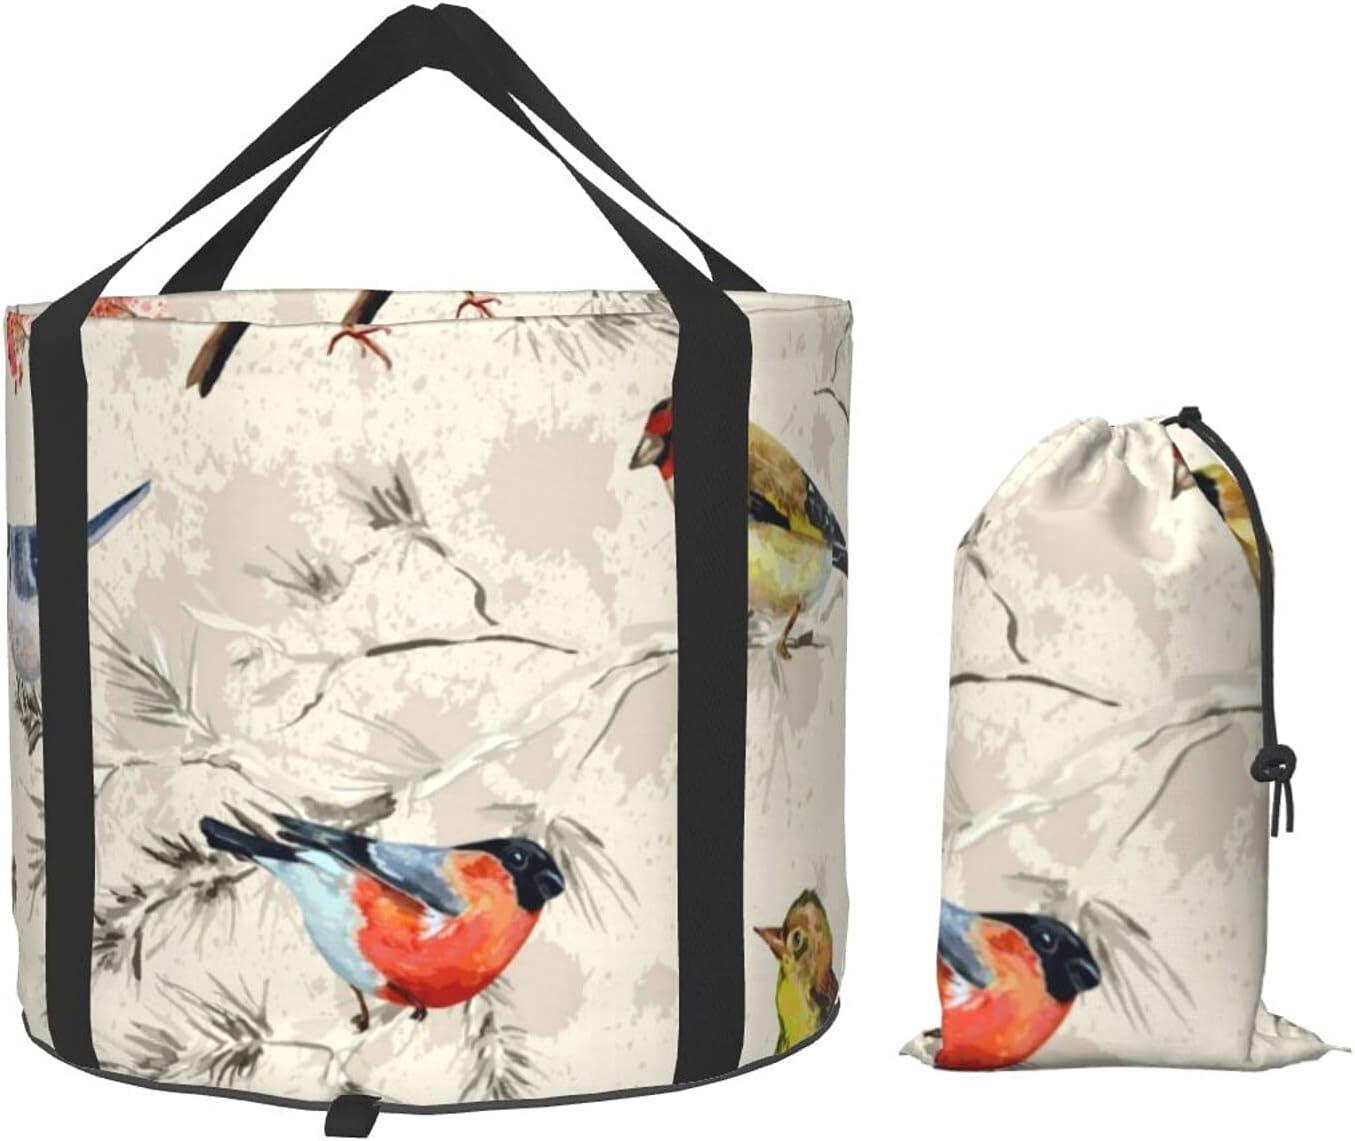 Watercolor Bird Collapsible Bucket Portable B Folding Basin 2021 model Wash Sale item